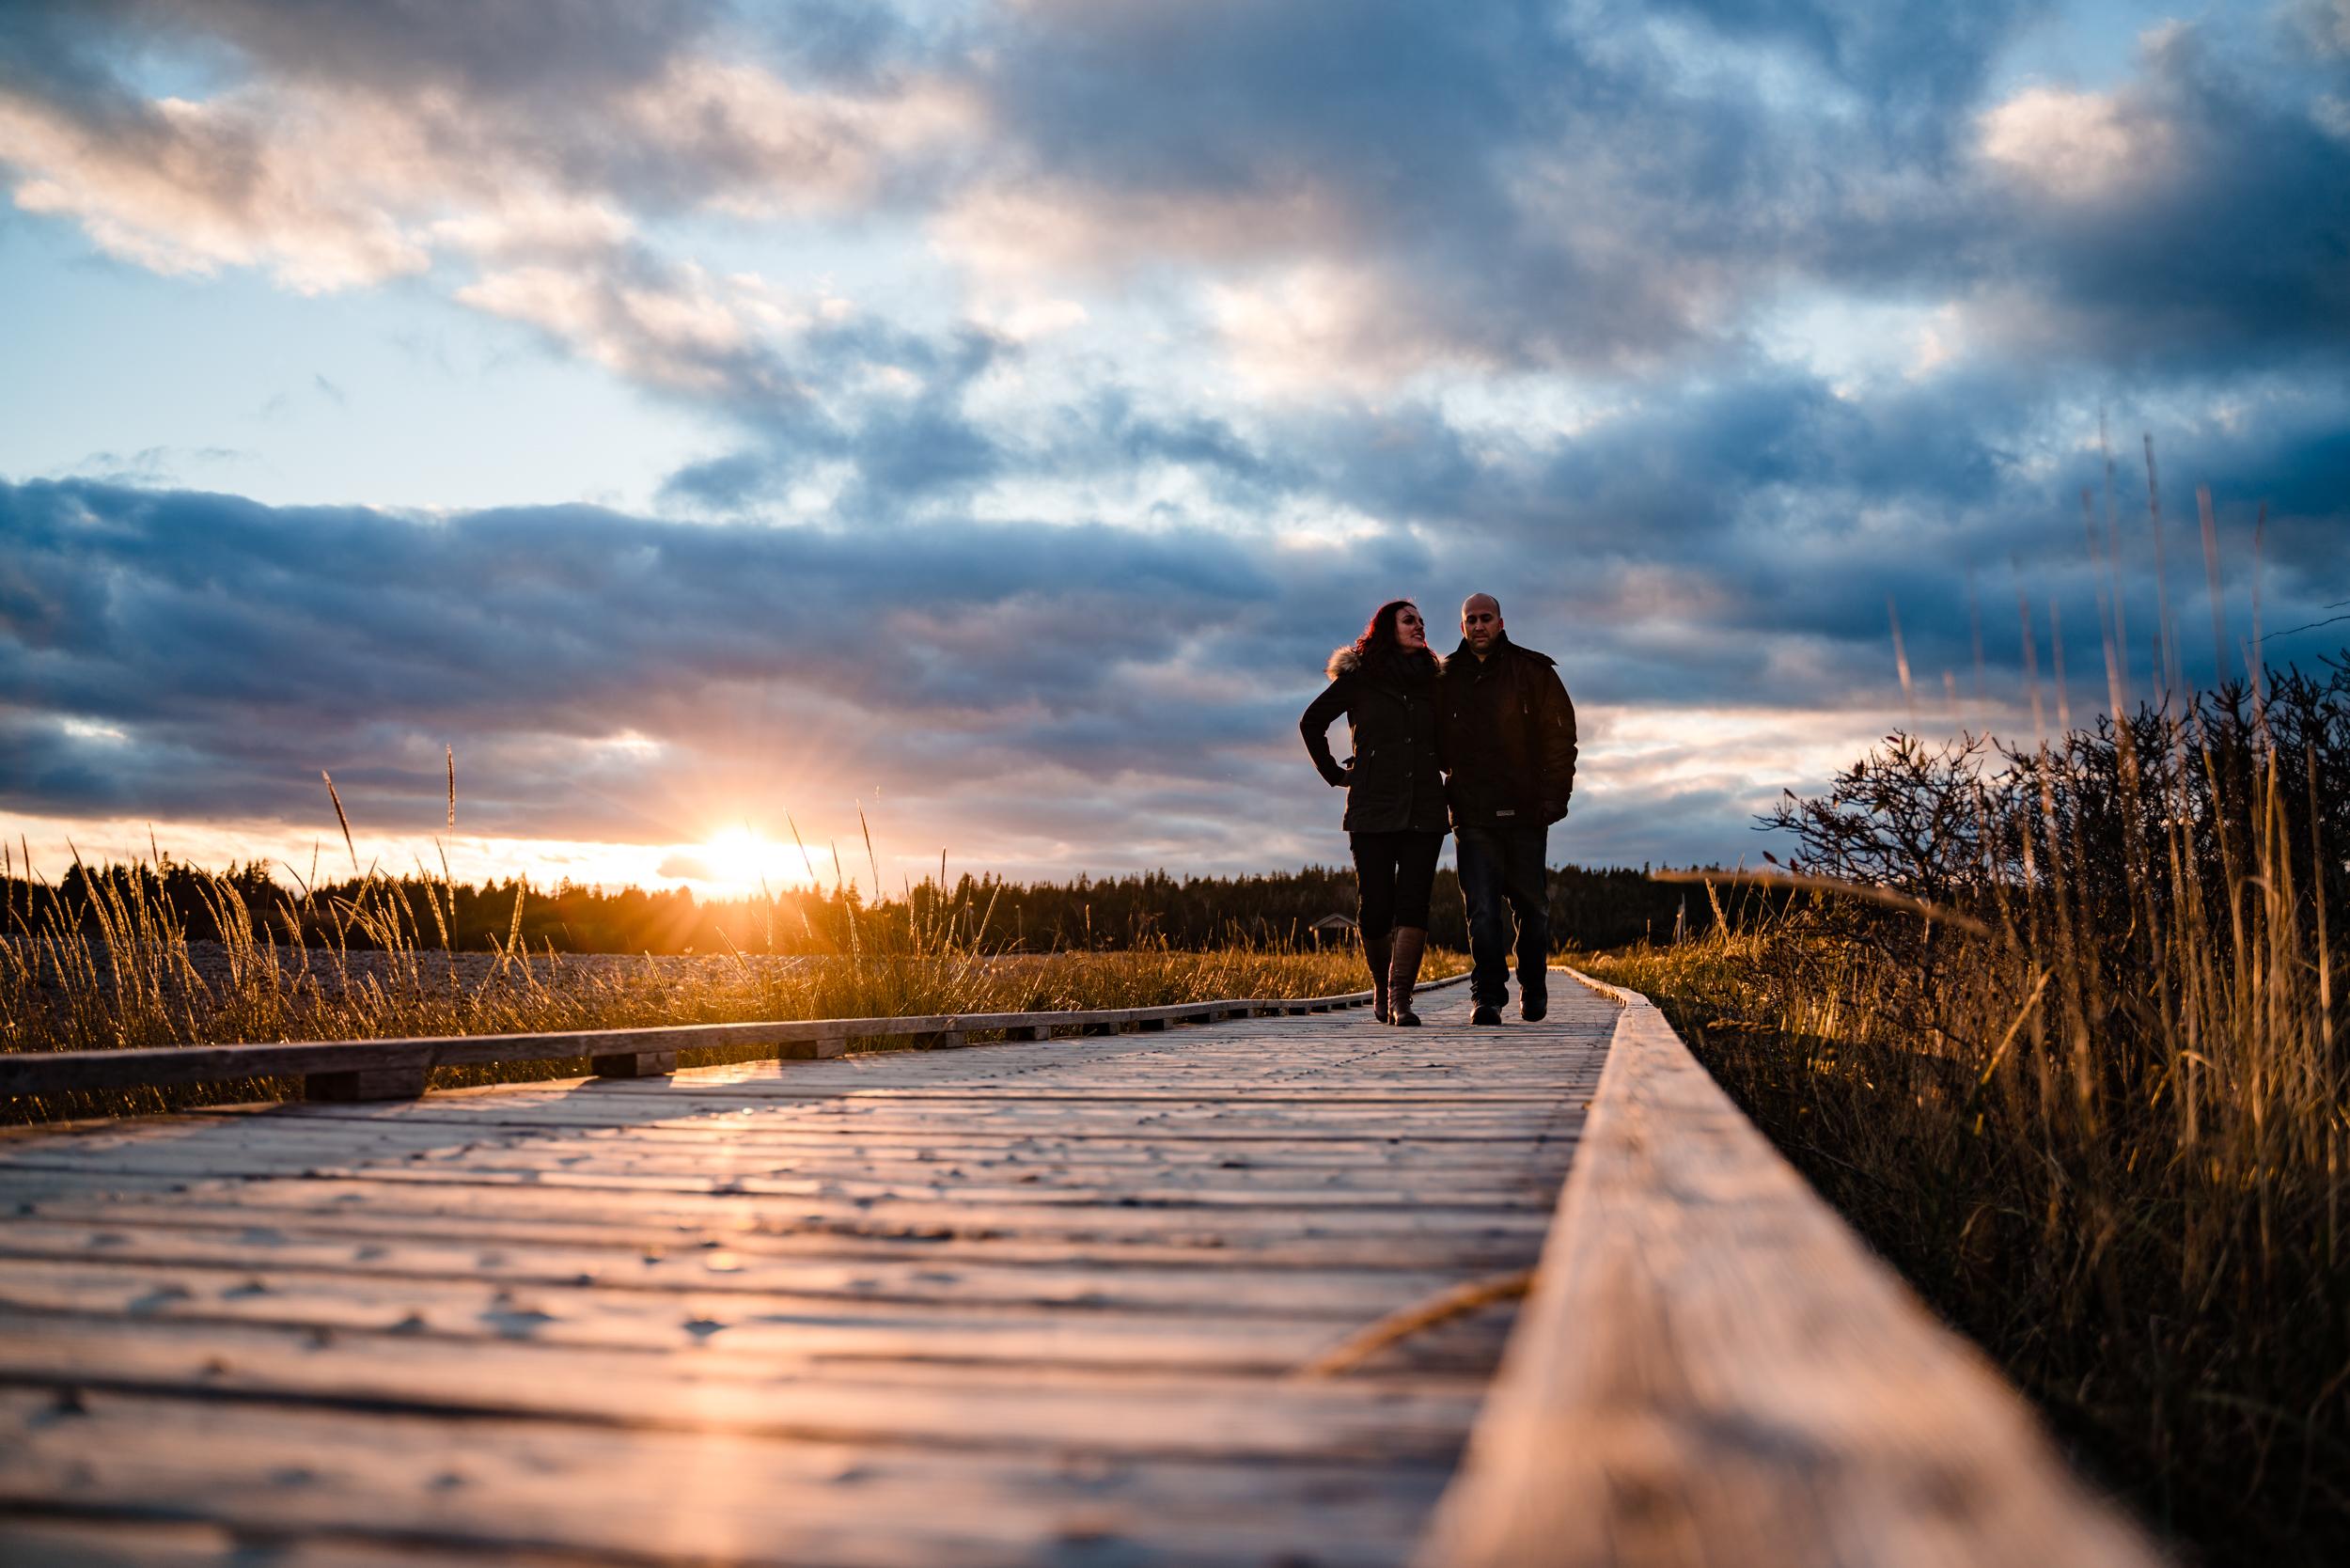 Sarah&Shayne-Halifax-engagement-weddingphotography-weddingphotographers-novascotia (37 of 41).jpg